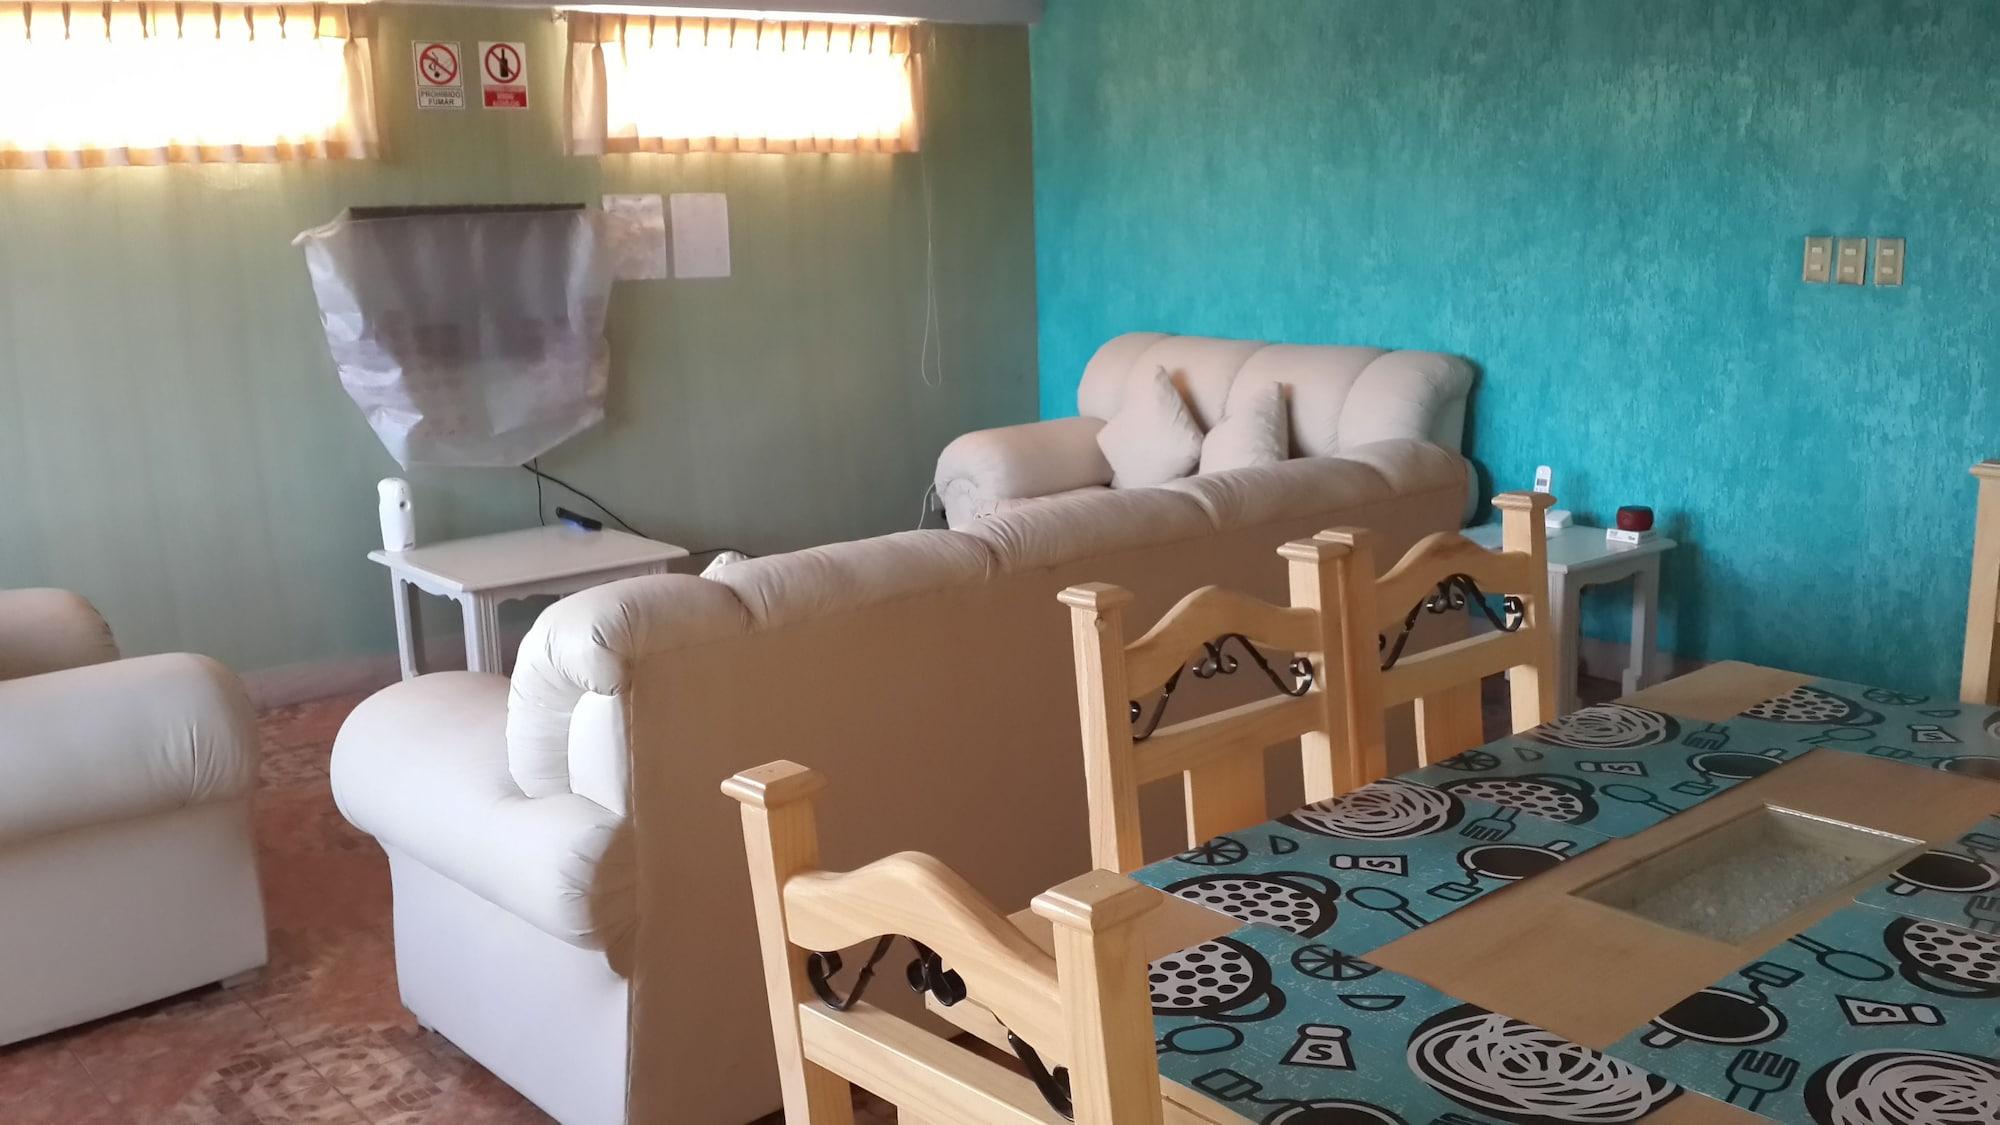 BTP City Apartments - Apart Hotel, Cercado